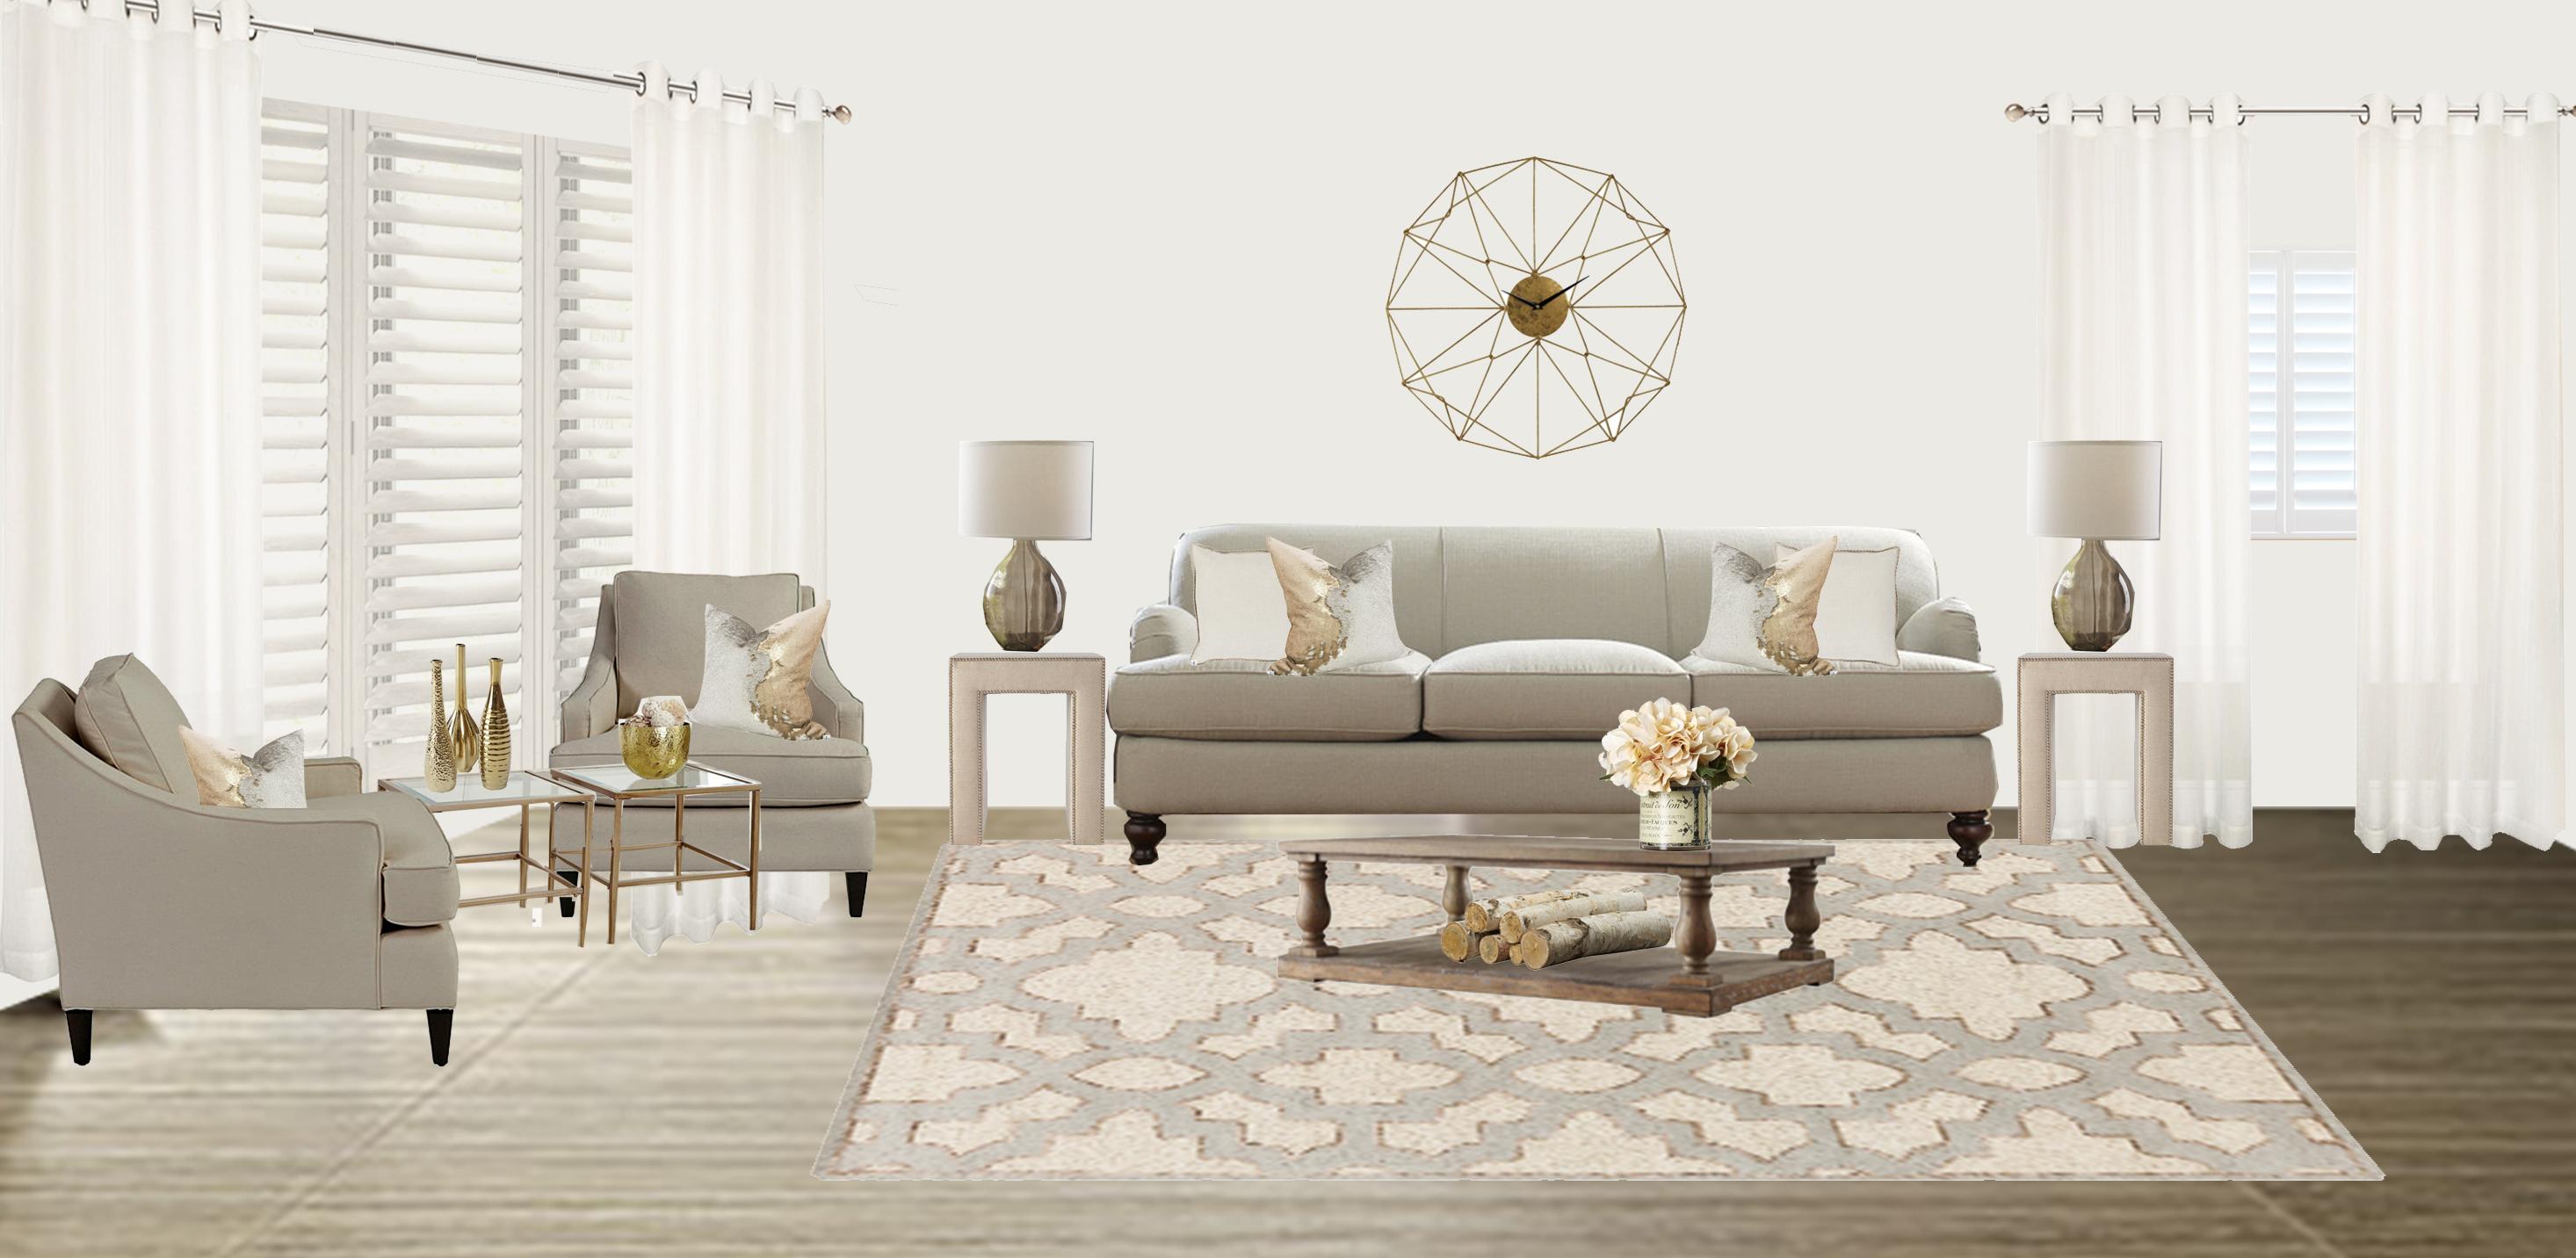 Virtual Interior Design Interior Design Product Finds Home